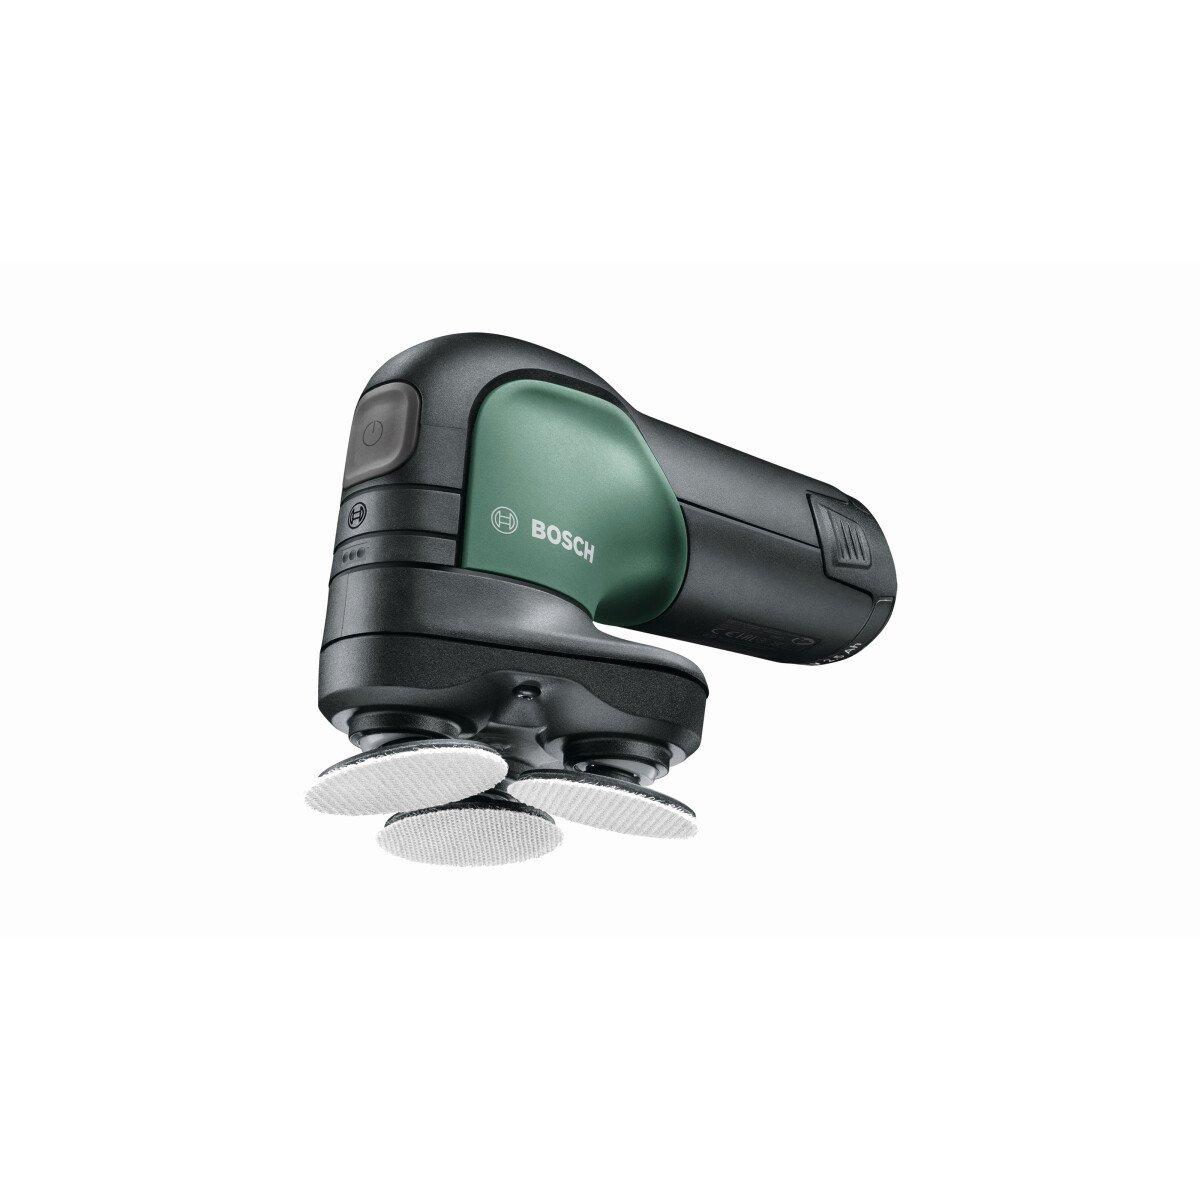 Bosch EasyCurvSander 12 12V Disc Sander / Polisher (1x2.5ah)